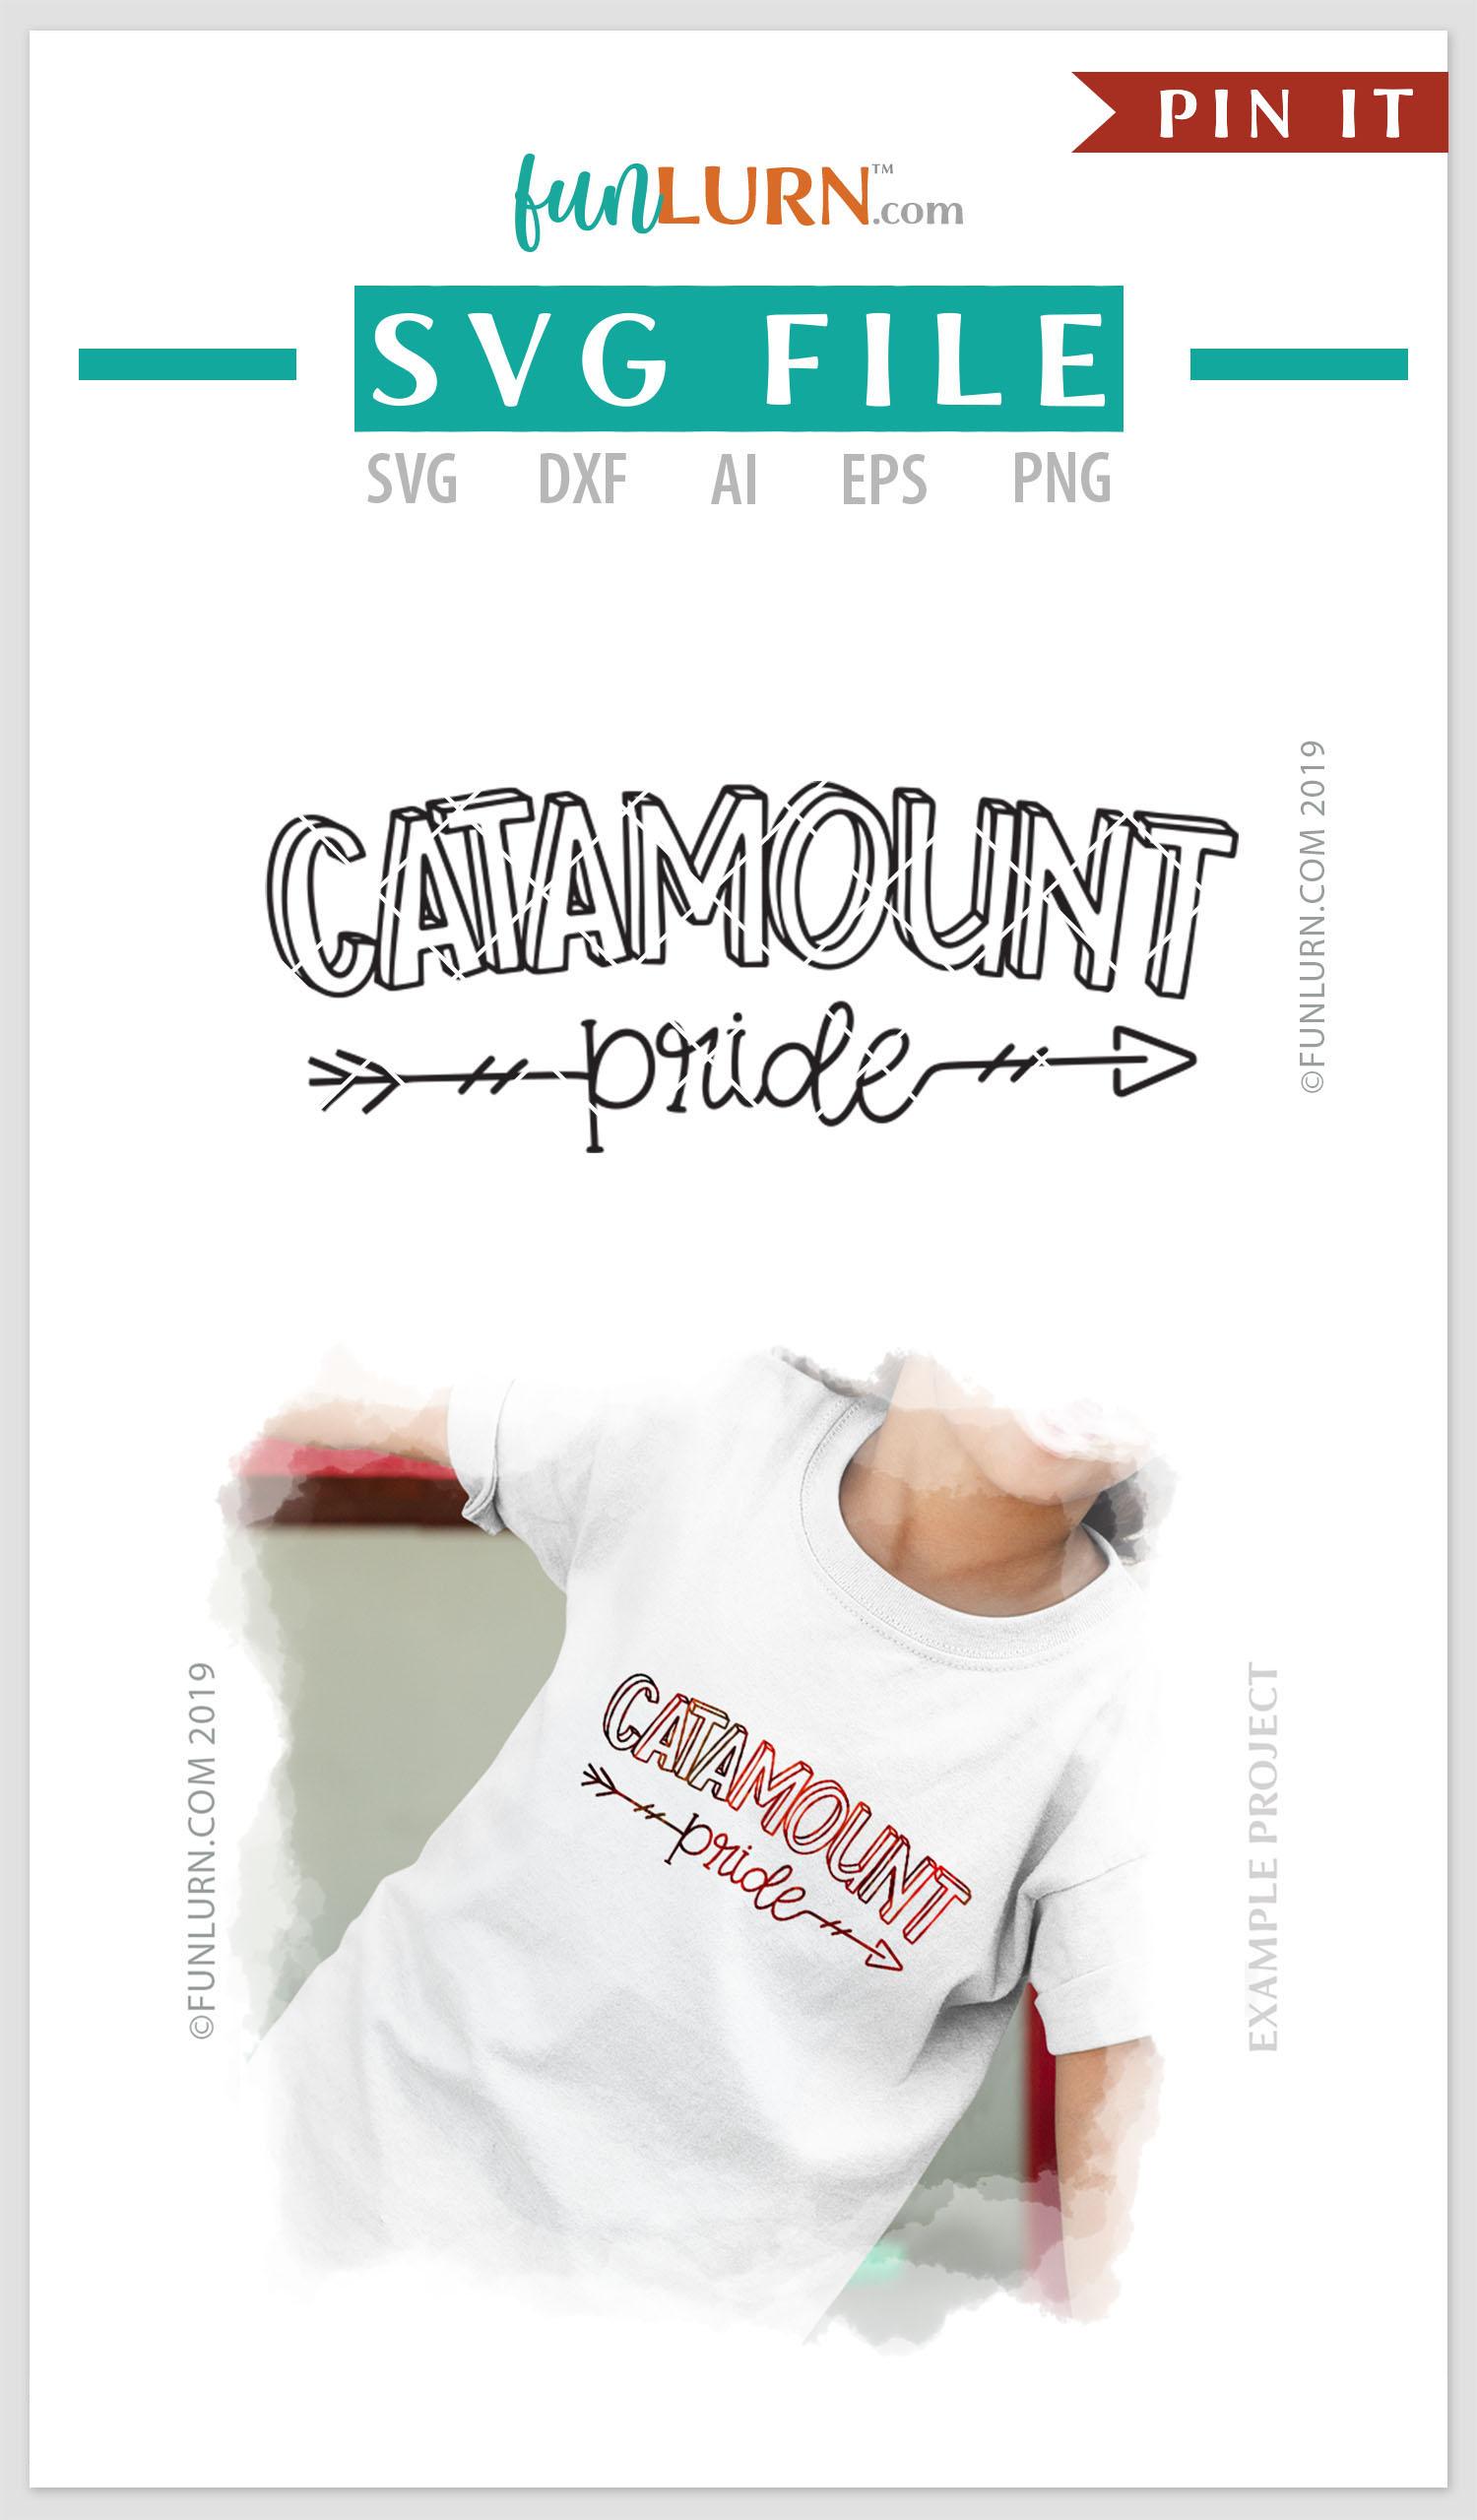 Catamount Pride Team SVG Cut File example image 4